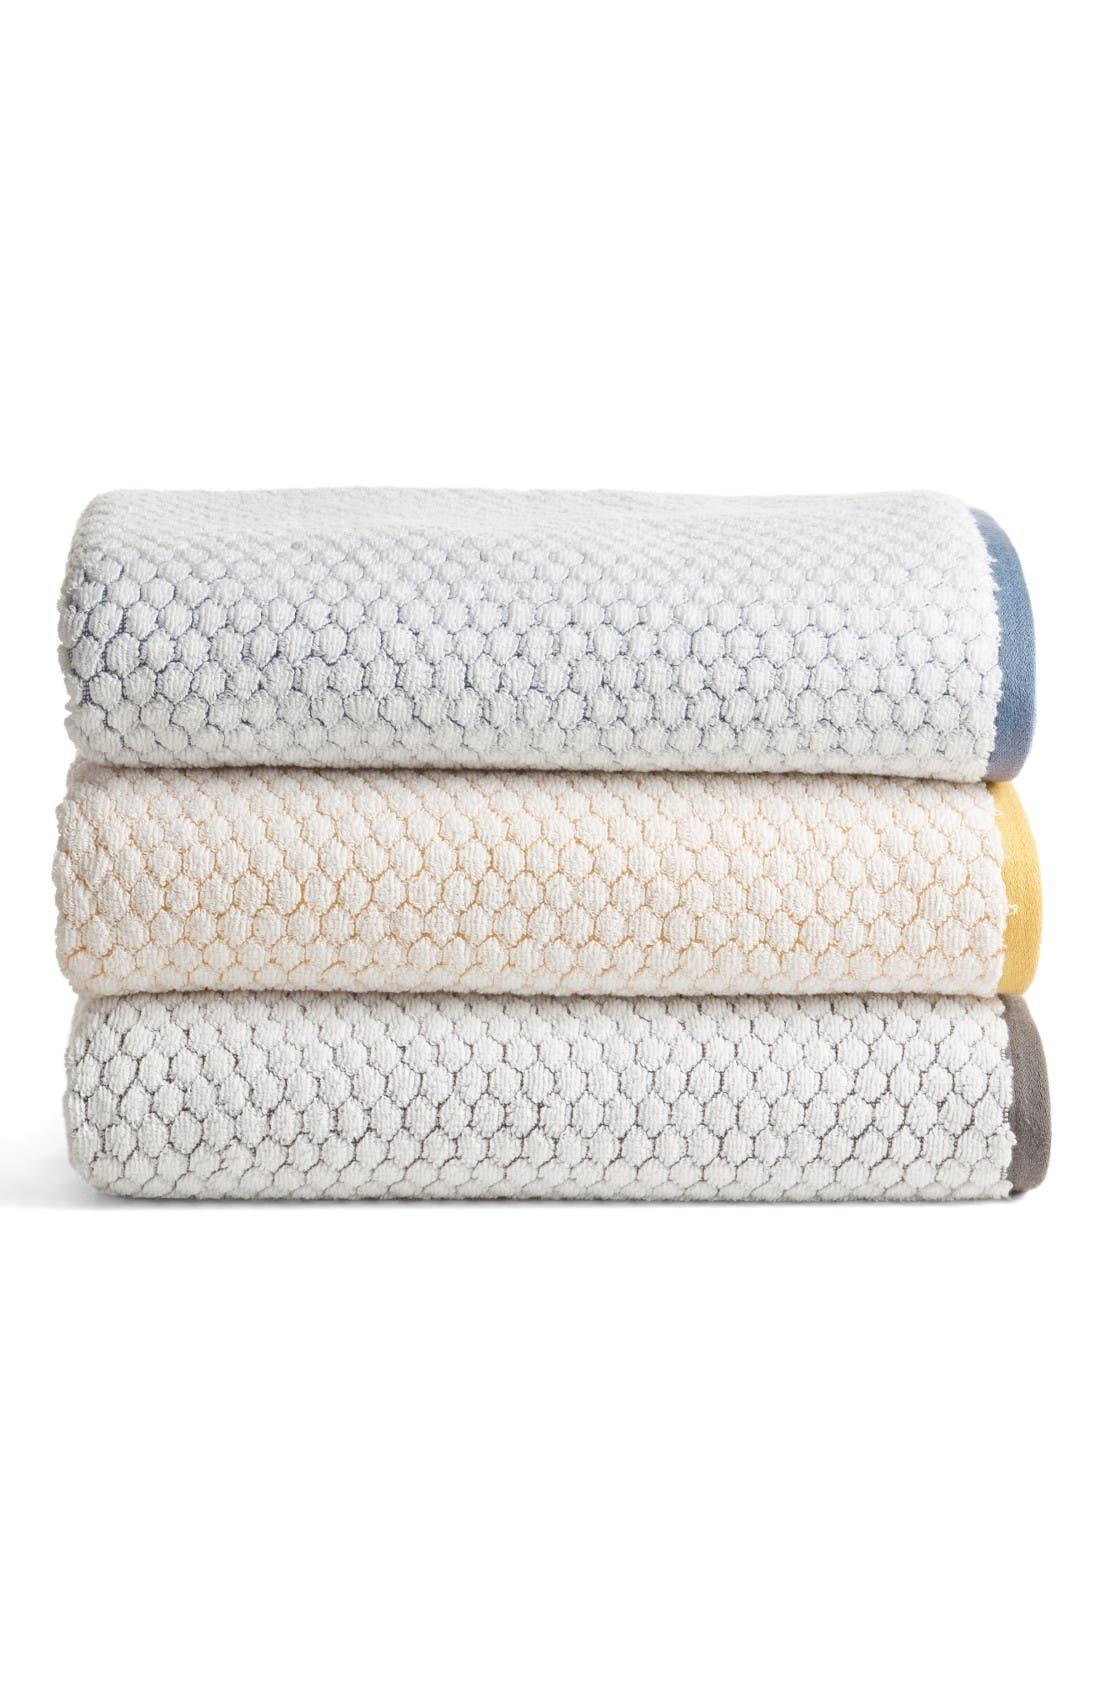 Alternate Image 2  - Nordstrom at Home Cobble Bath Towel (2 for $49)